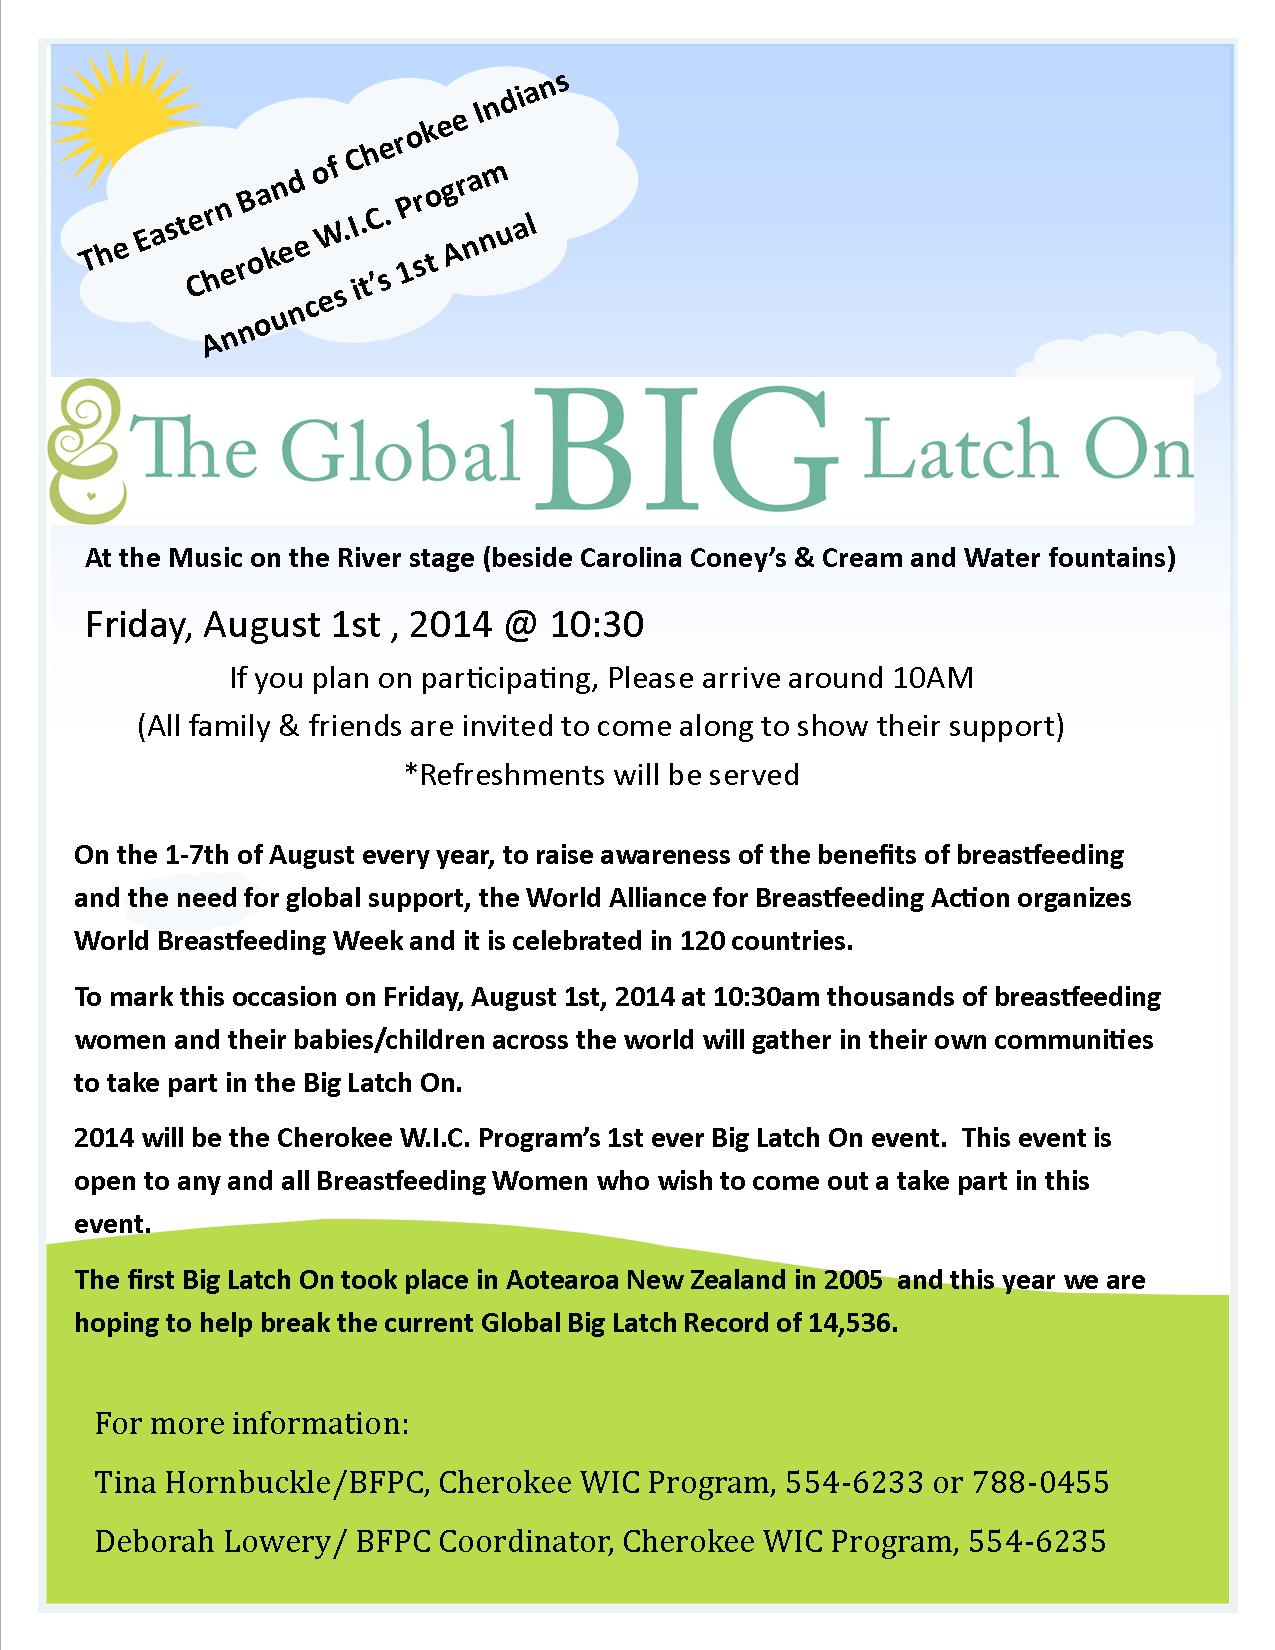 The big latch on (2)